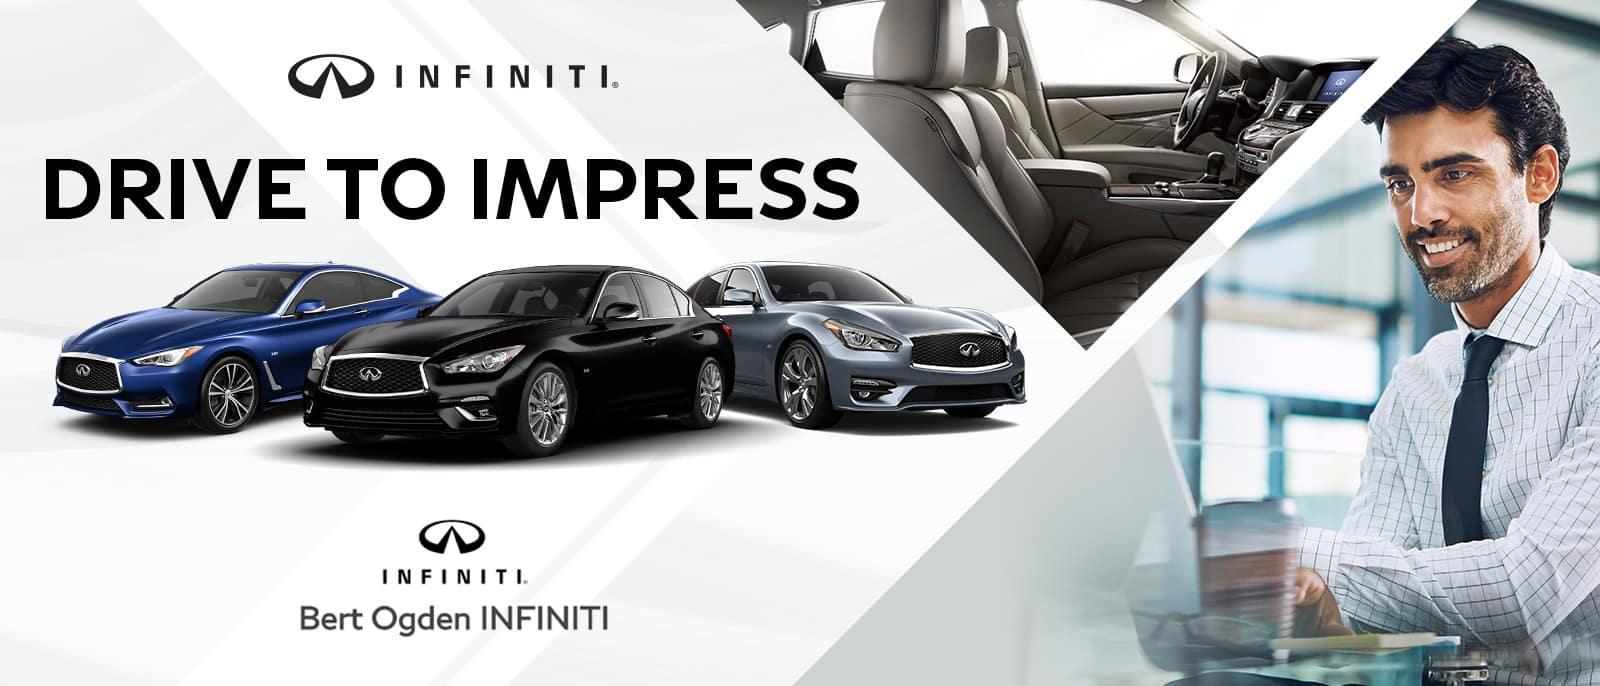 Drive to Impress | Bert Ogden INFINITI | Edinburg, TX